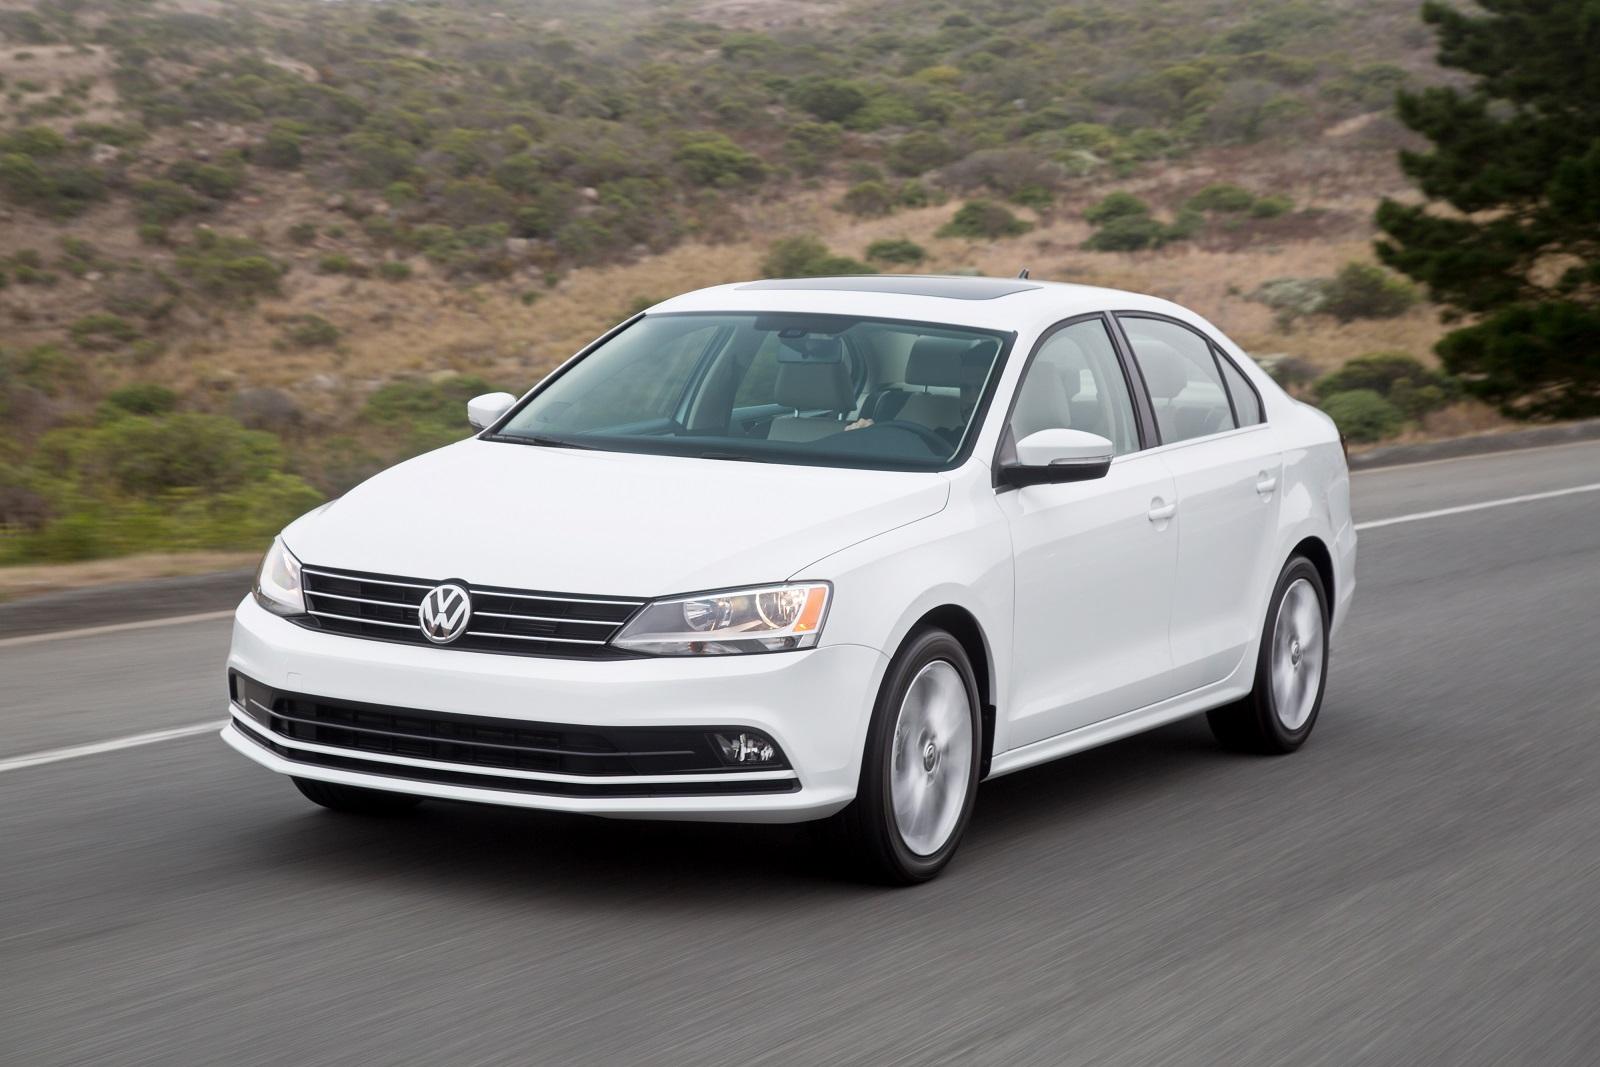 2016 Volkswagen Jetta (vw) Review, Ratings, Specs, Prices